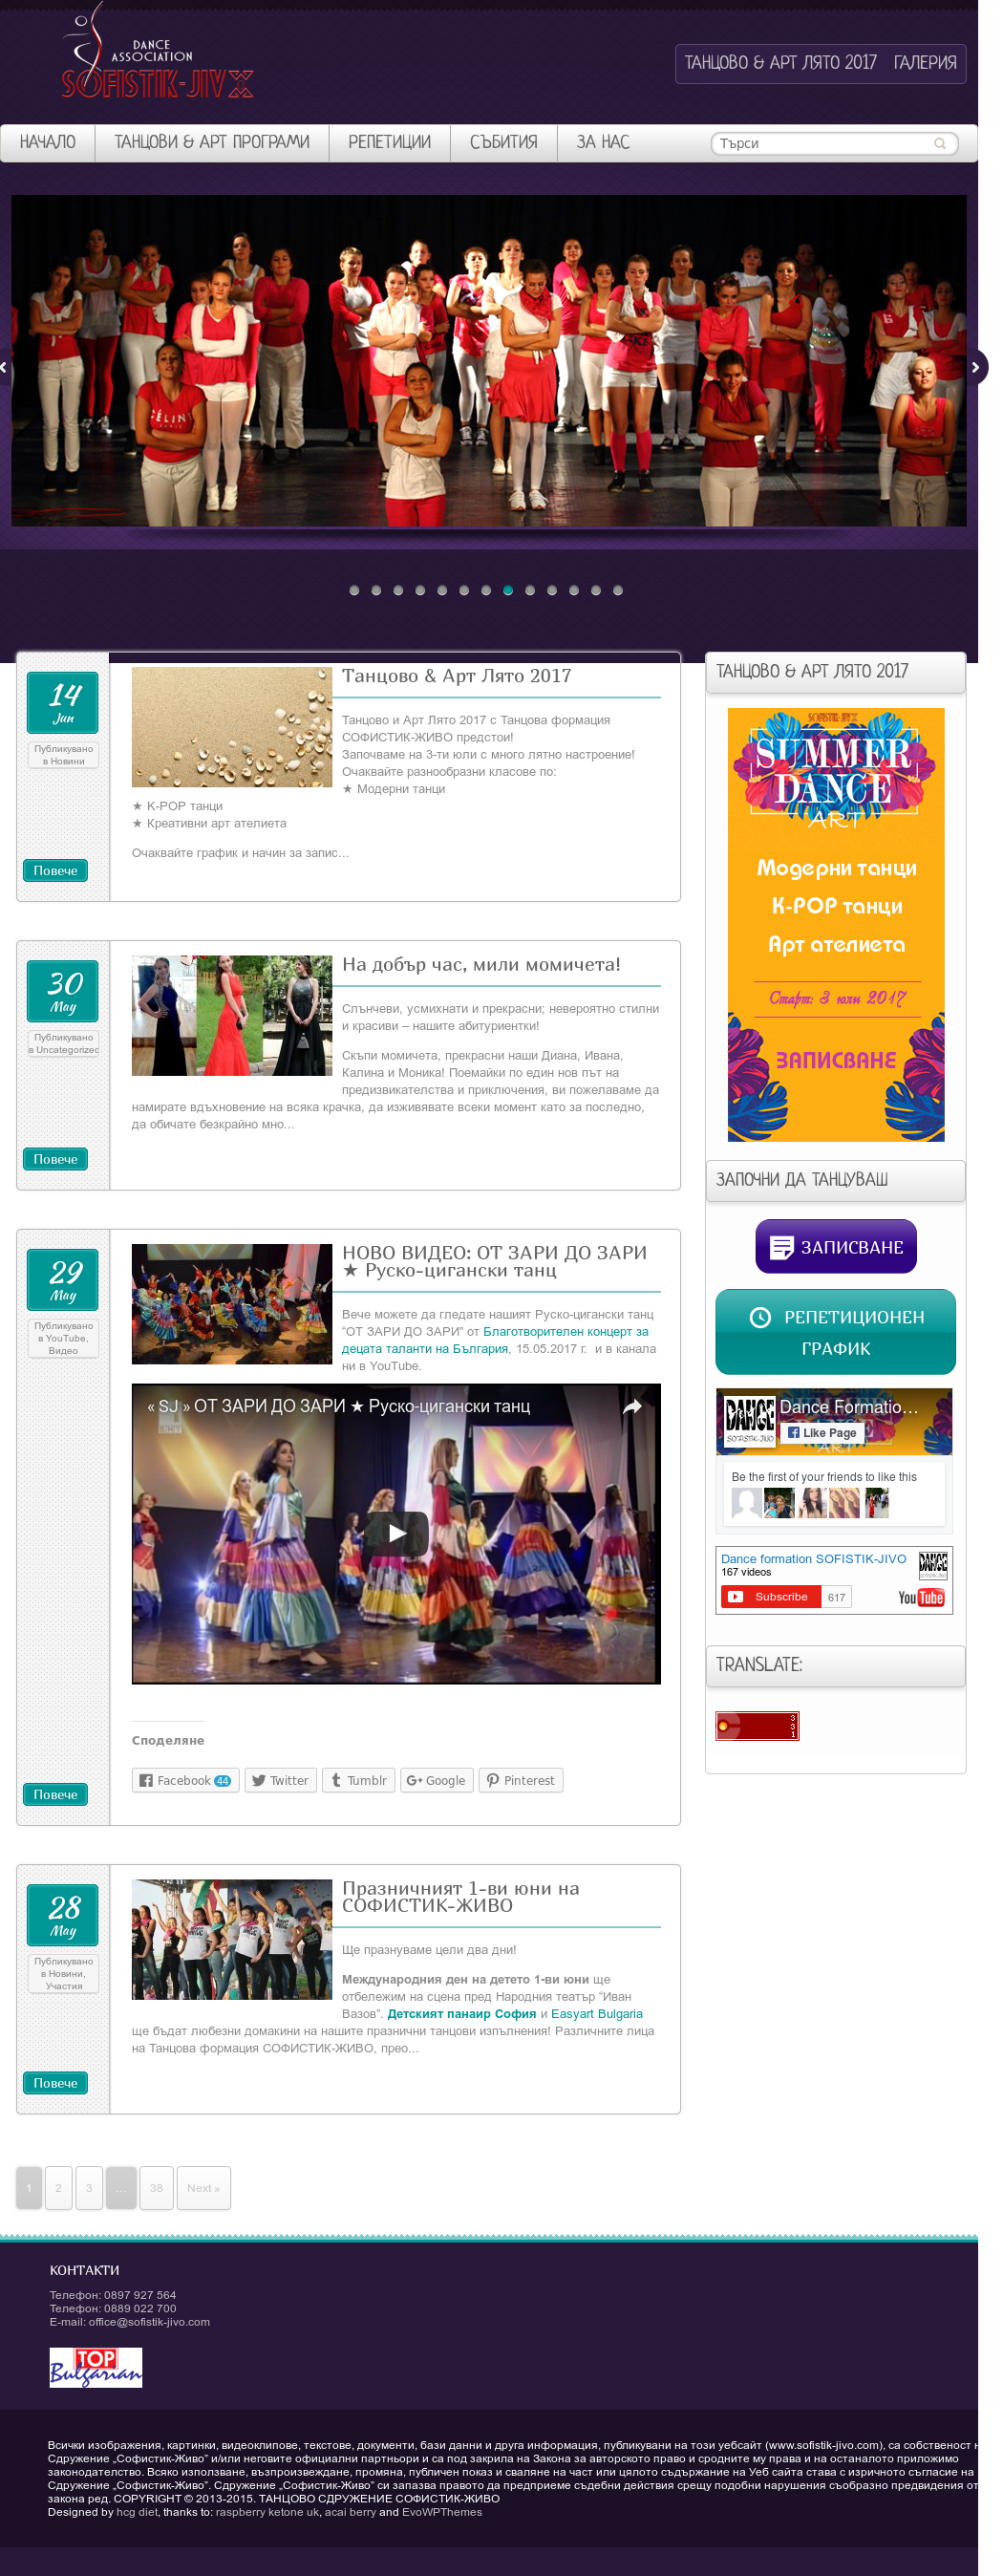 Dance Formation Sofistik-jivo Competitors, Revenue and